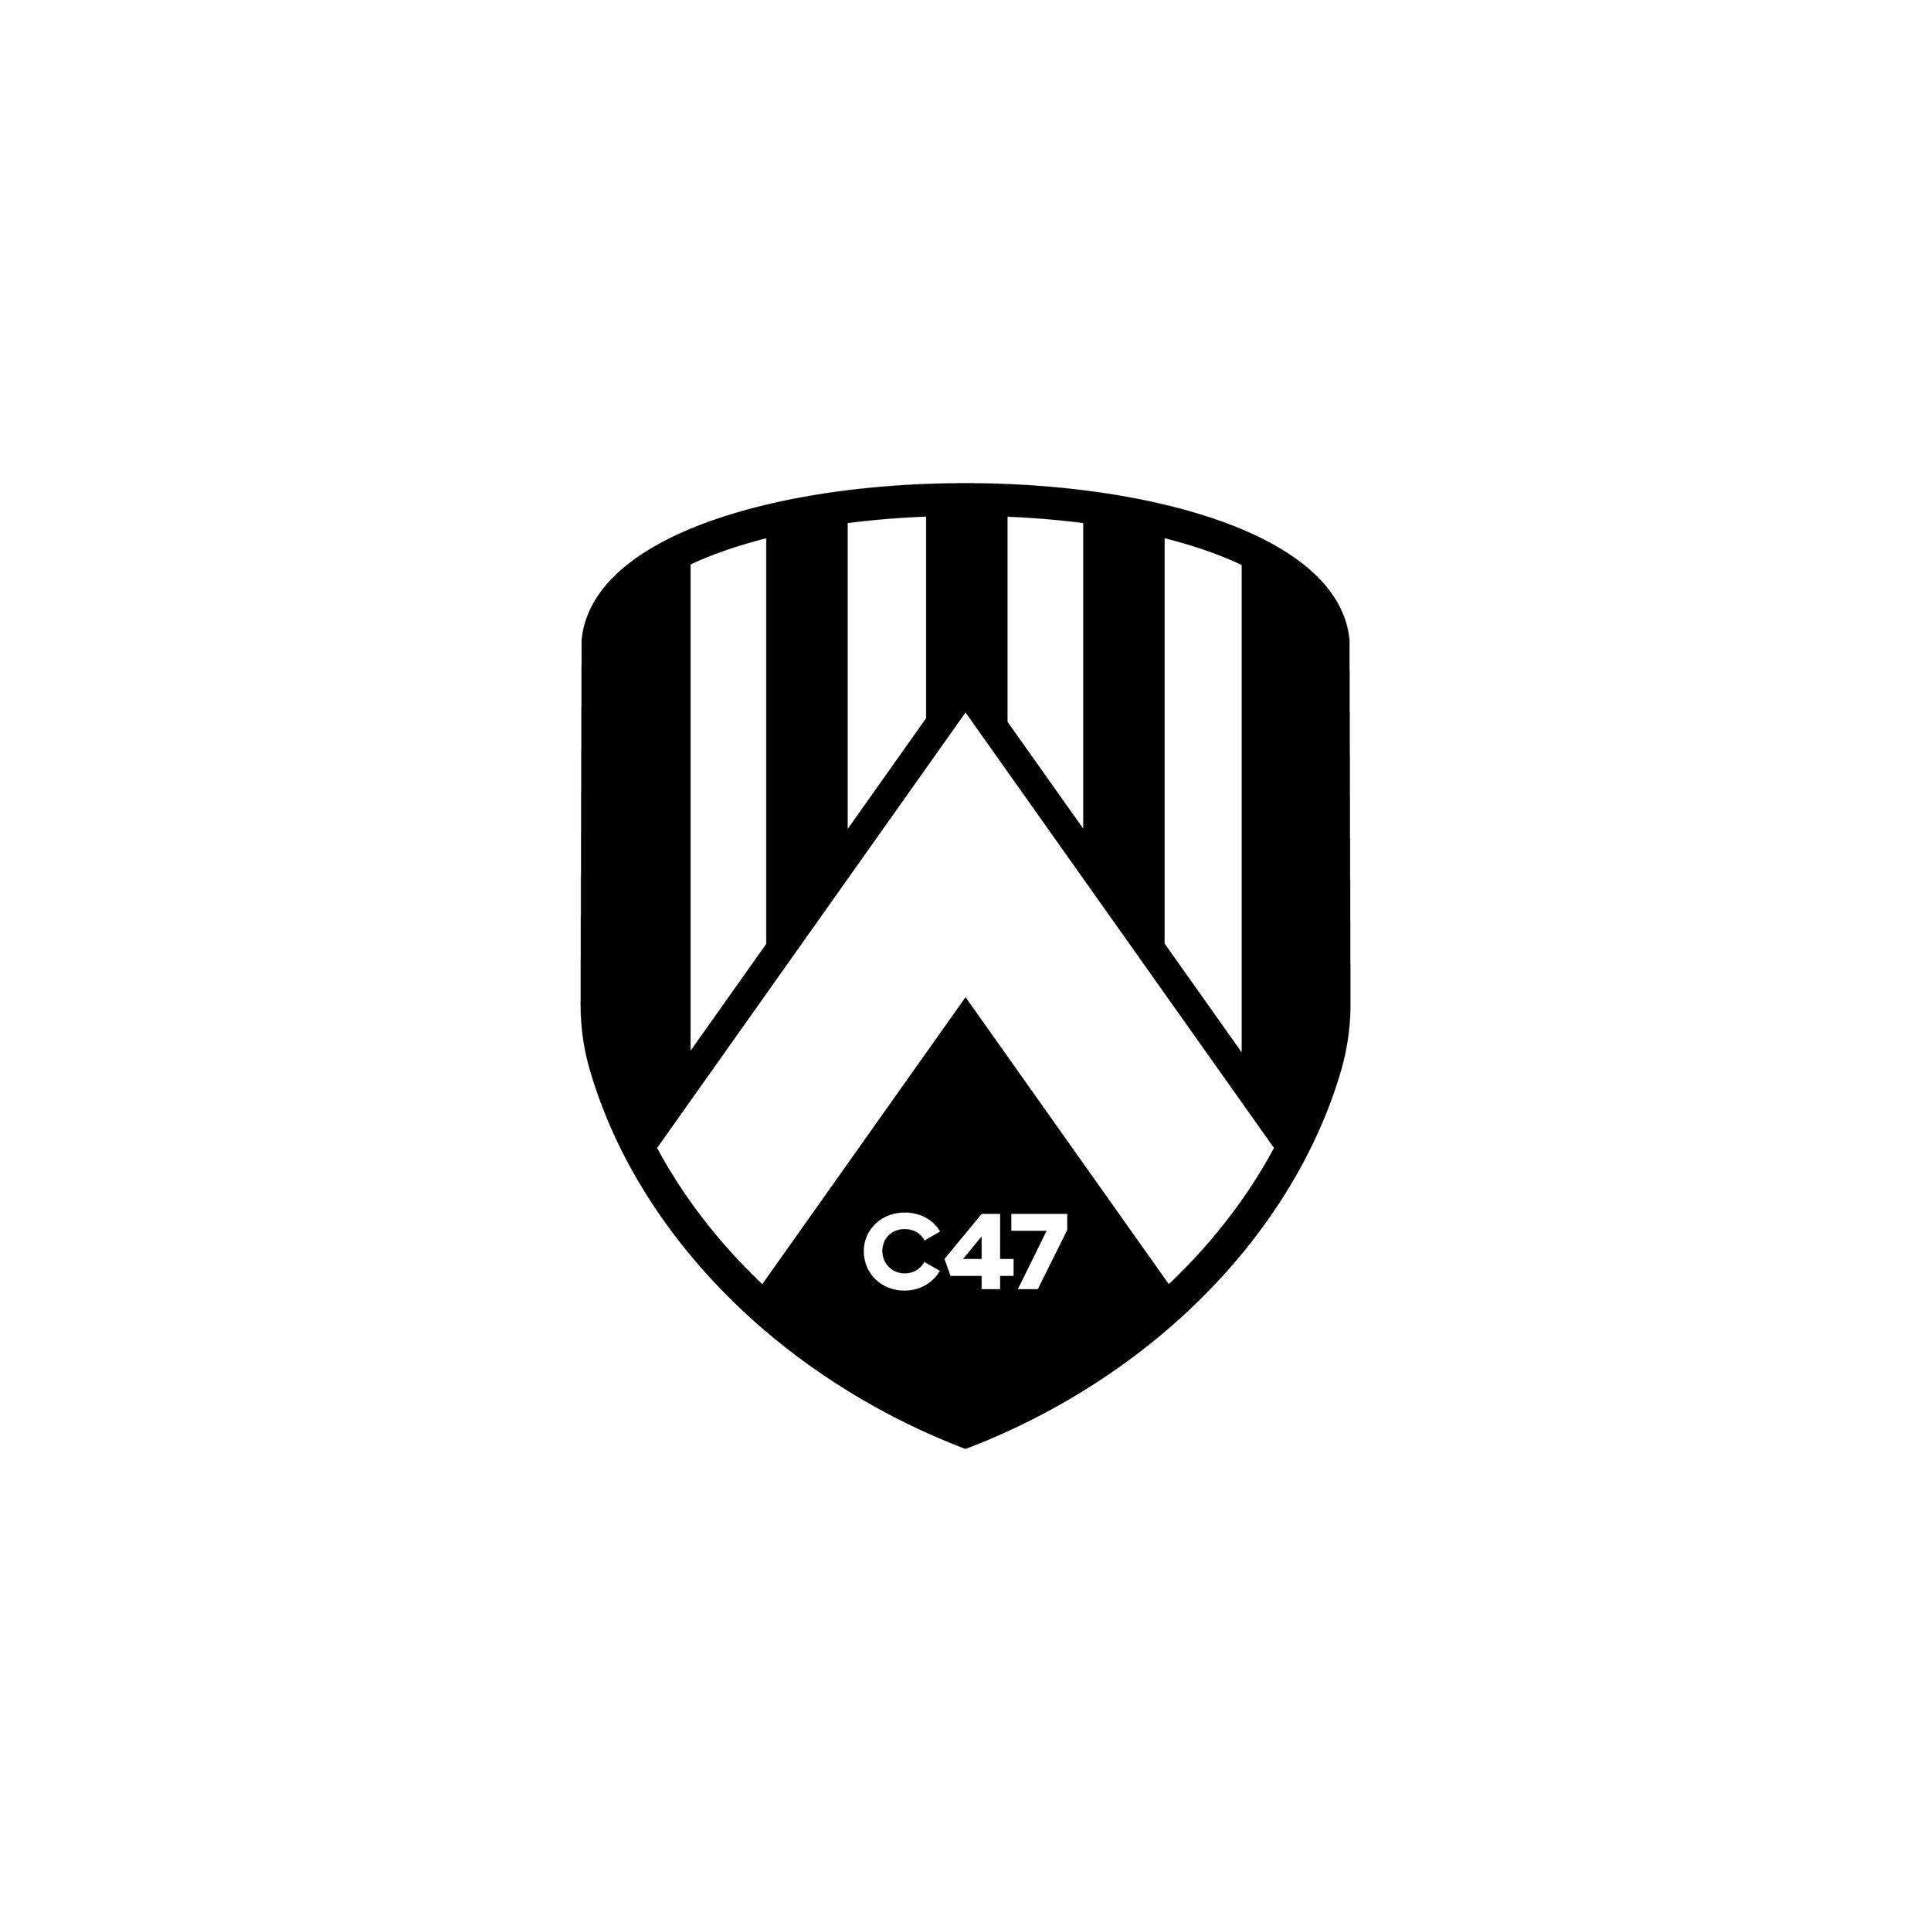 GMSA Crest Redesign-06.jpg